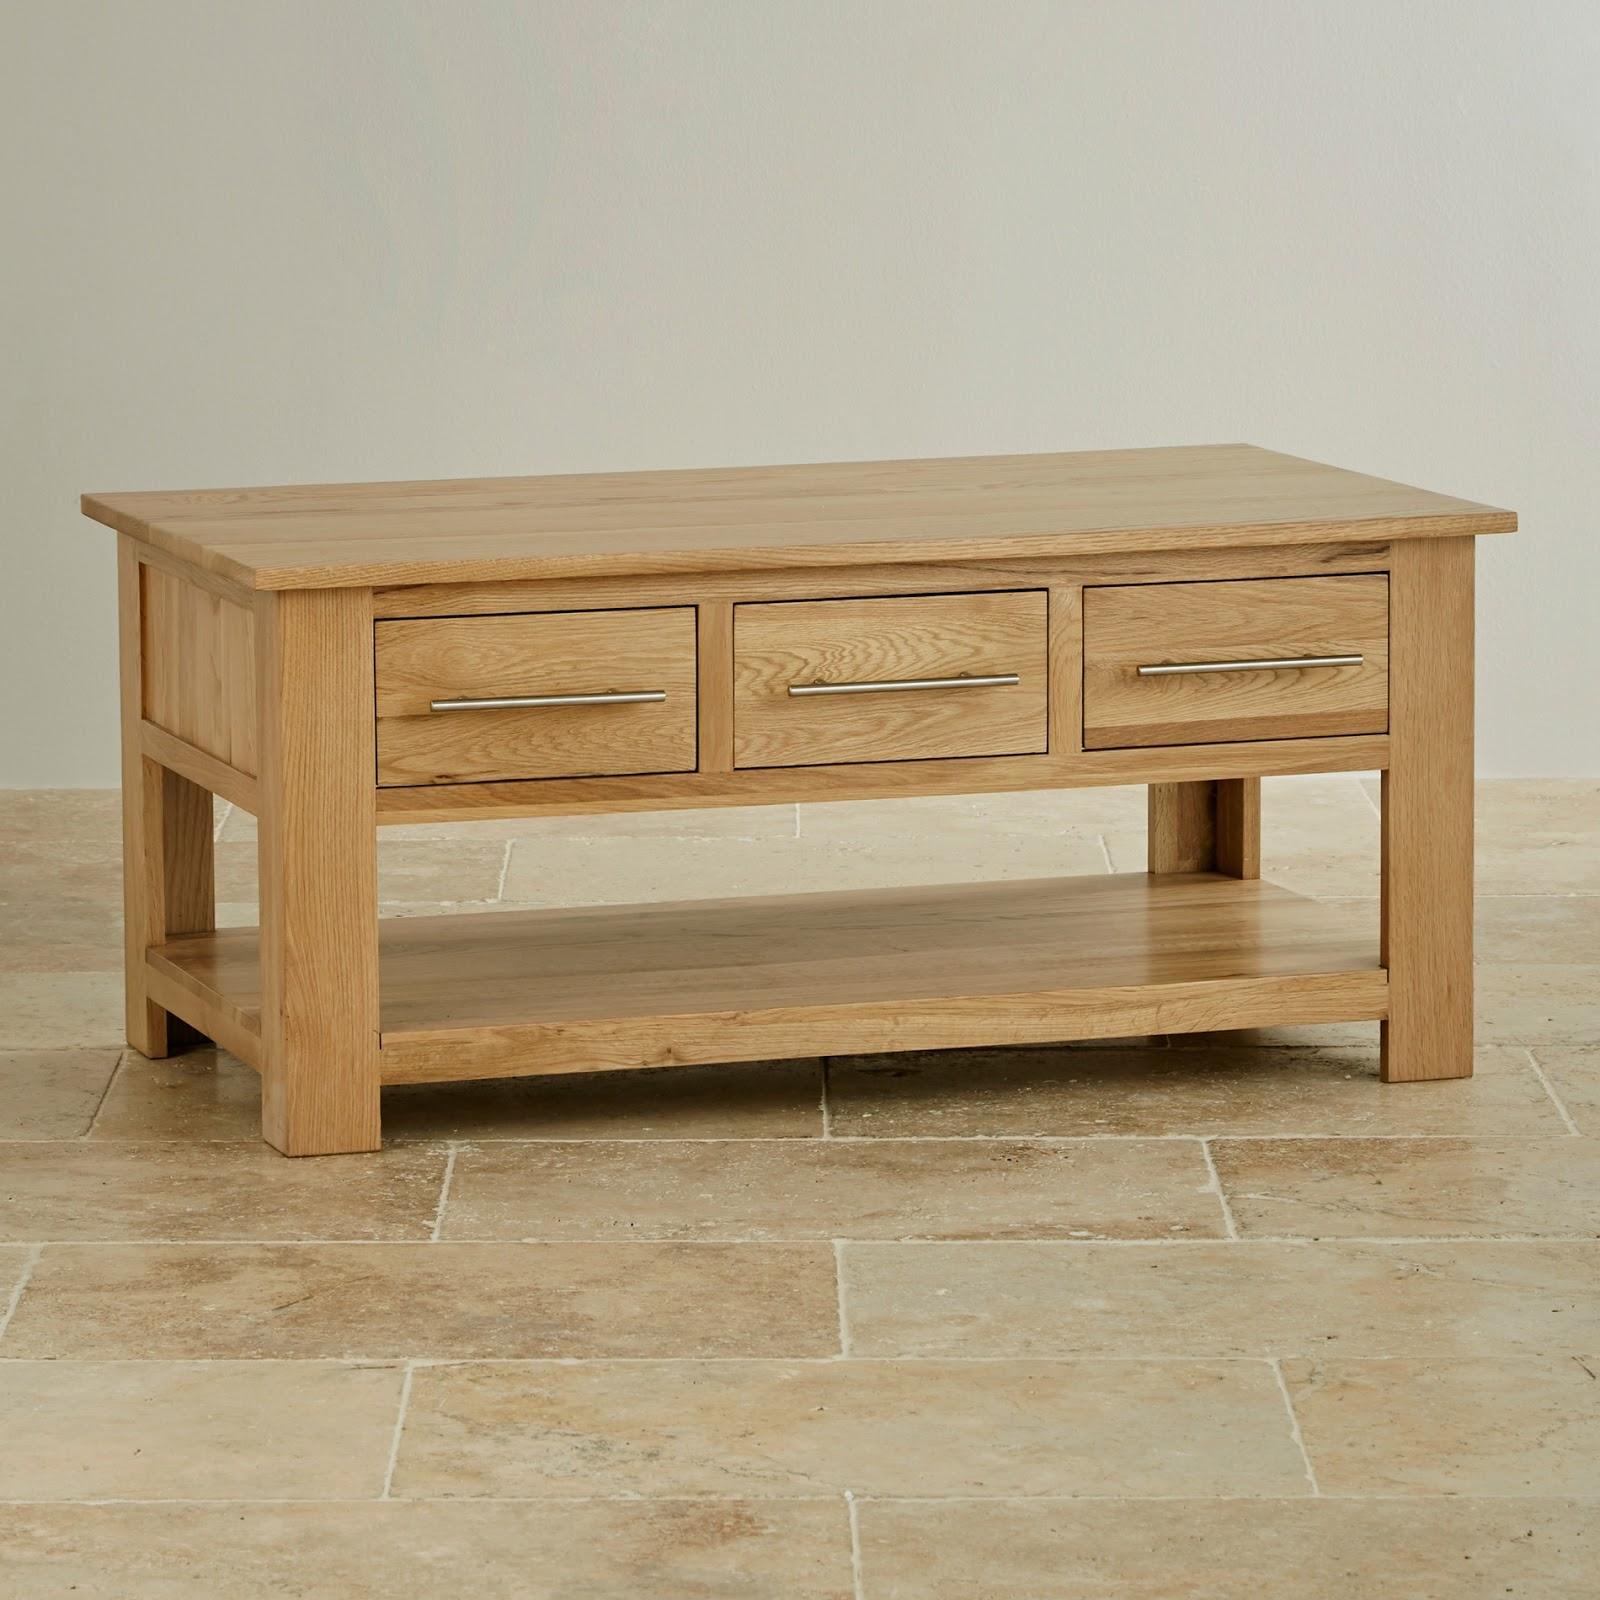 Fantastic Oak Side Table With Shelf Best Image Resource